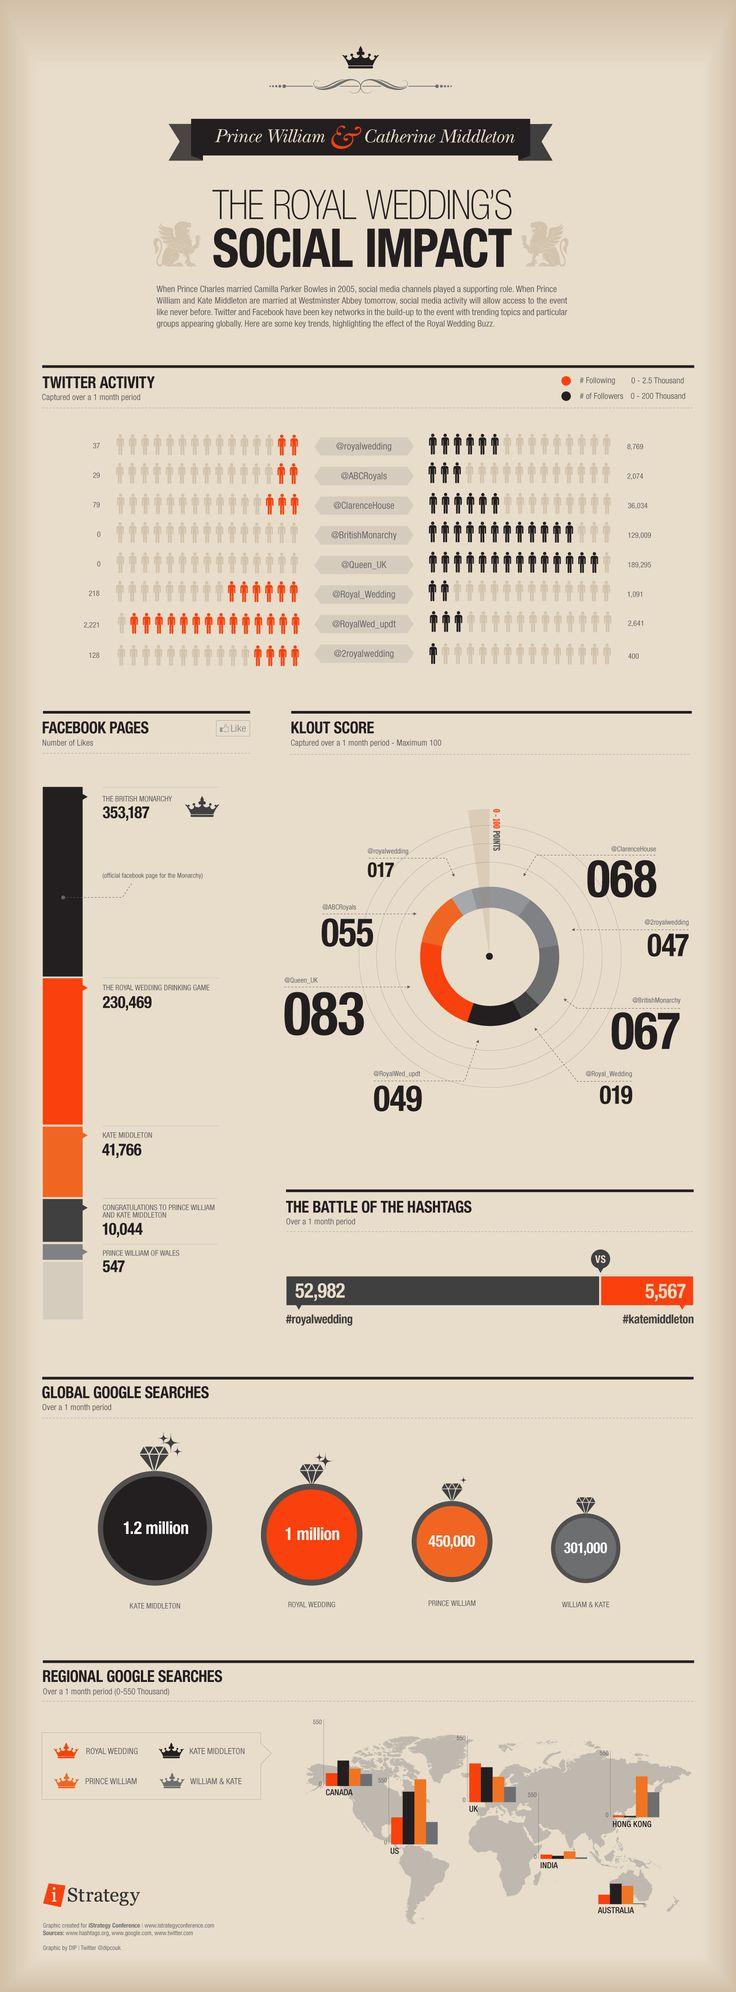 royal wedding social media info graphic